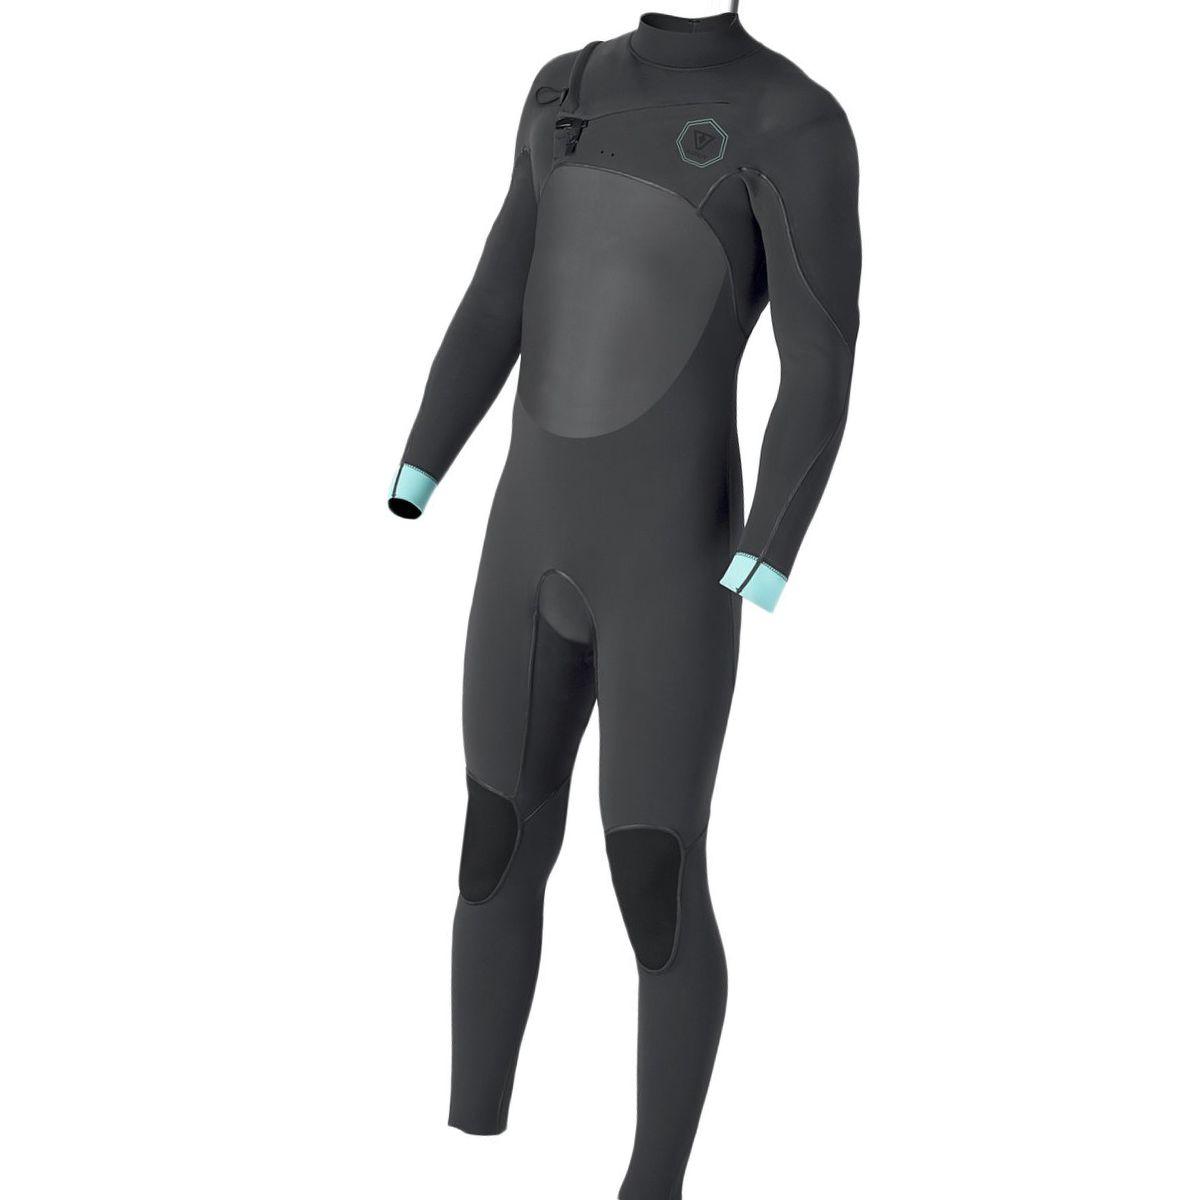 Vissla North Seas 3/2 Long-Sleeve Chest-Zip Full Wetsuit - Men's